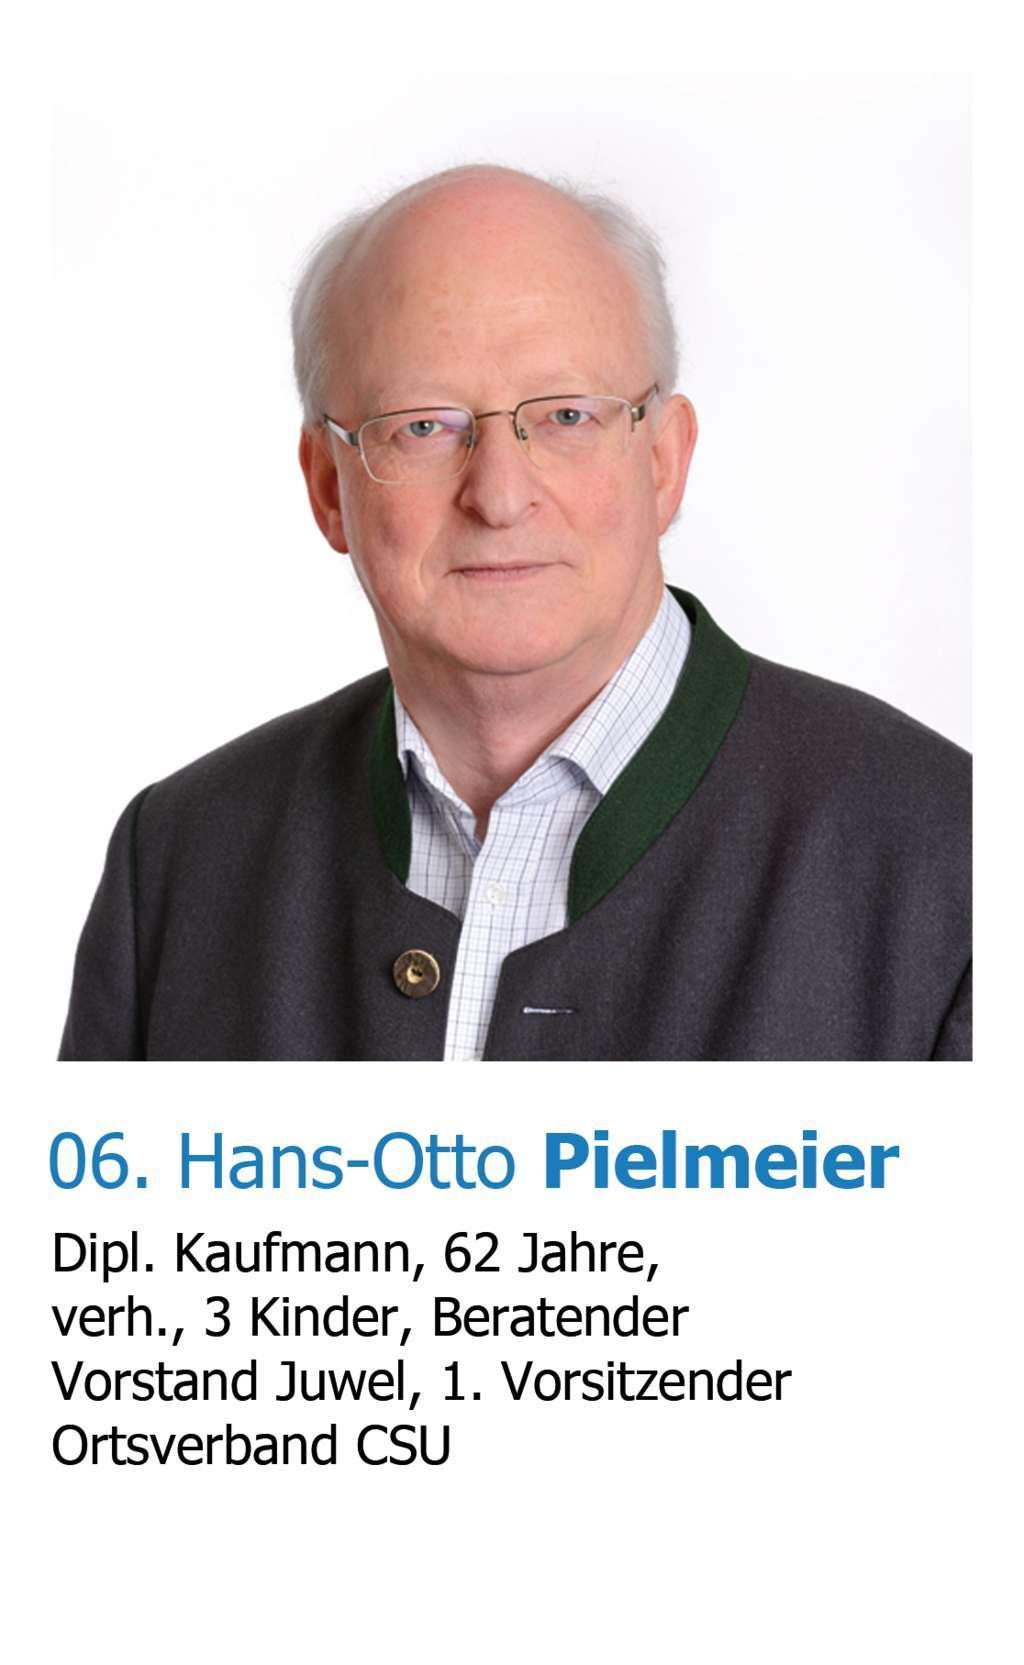 Has Otto Pielmeier